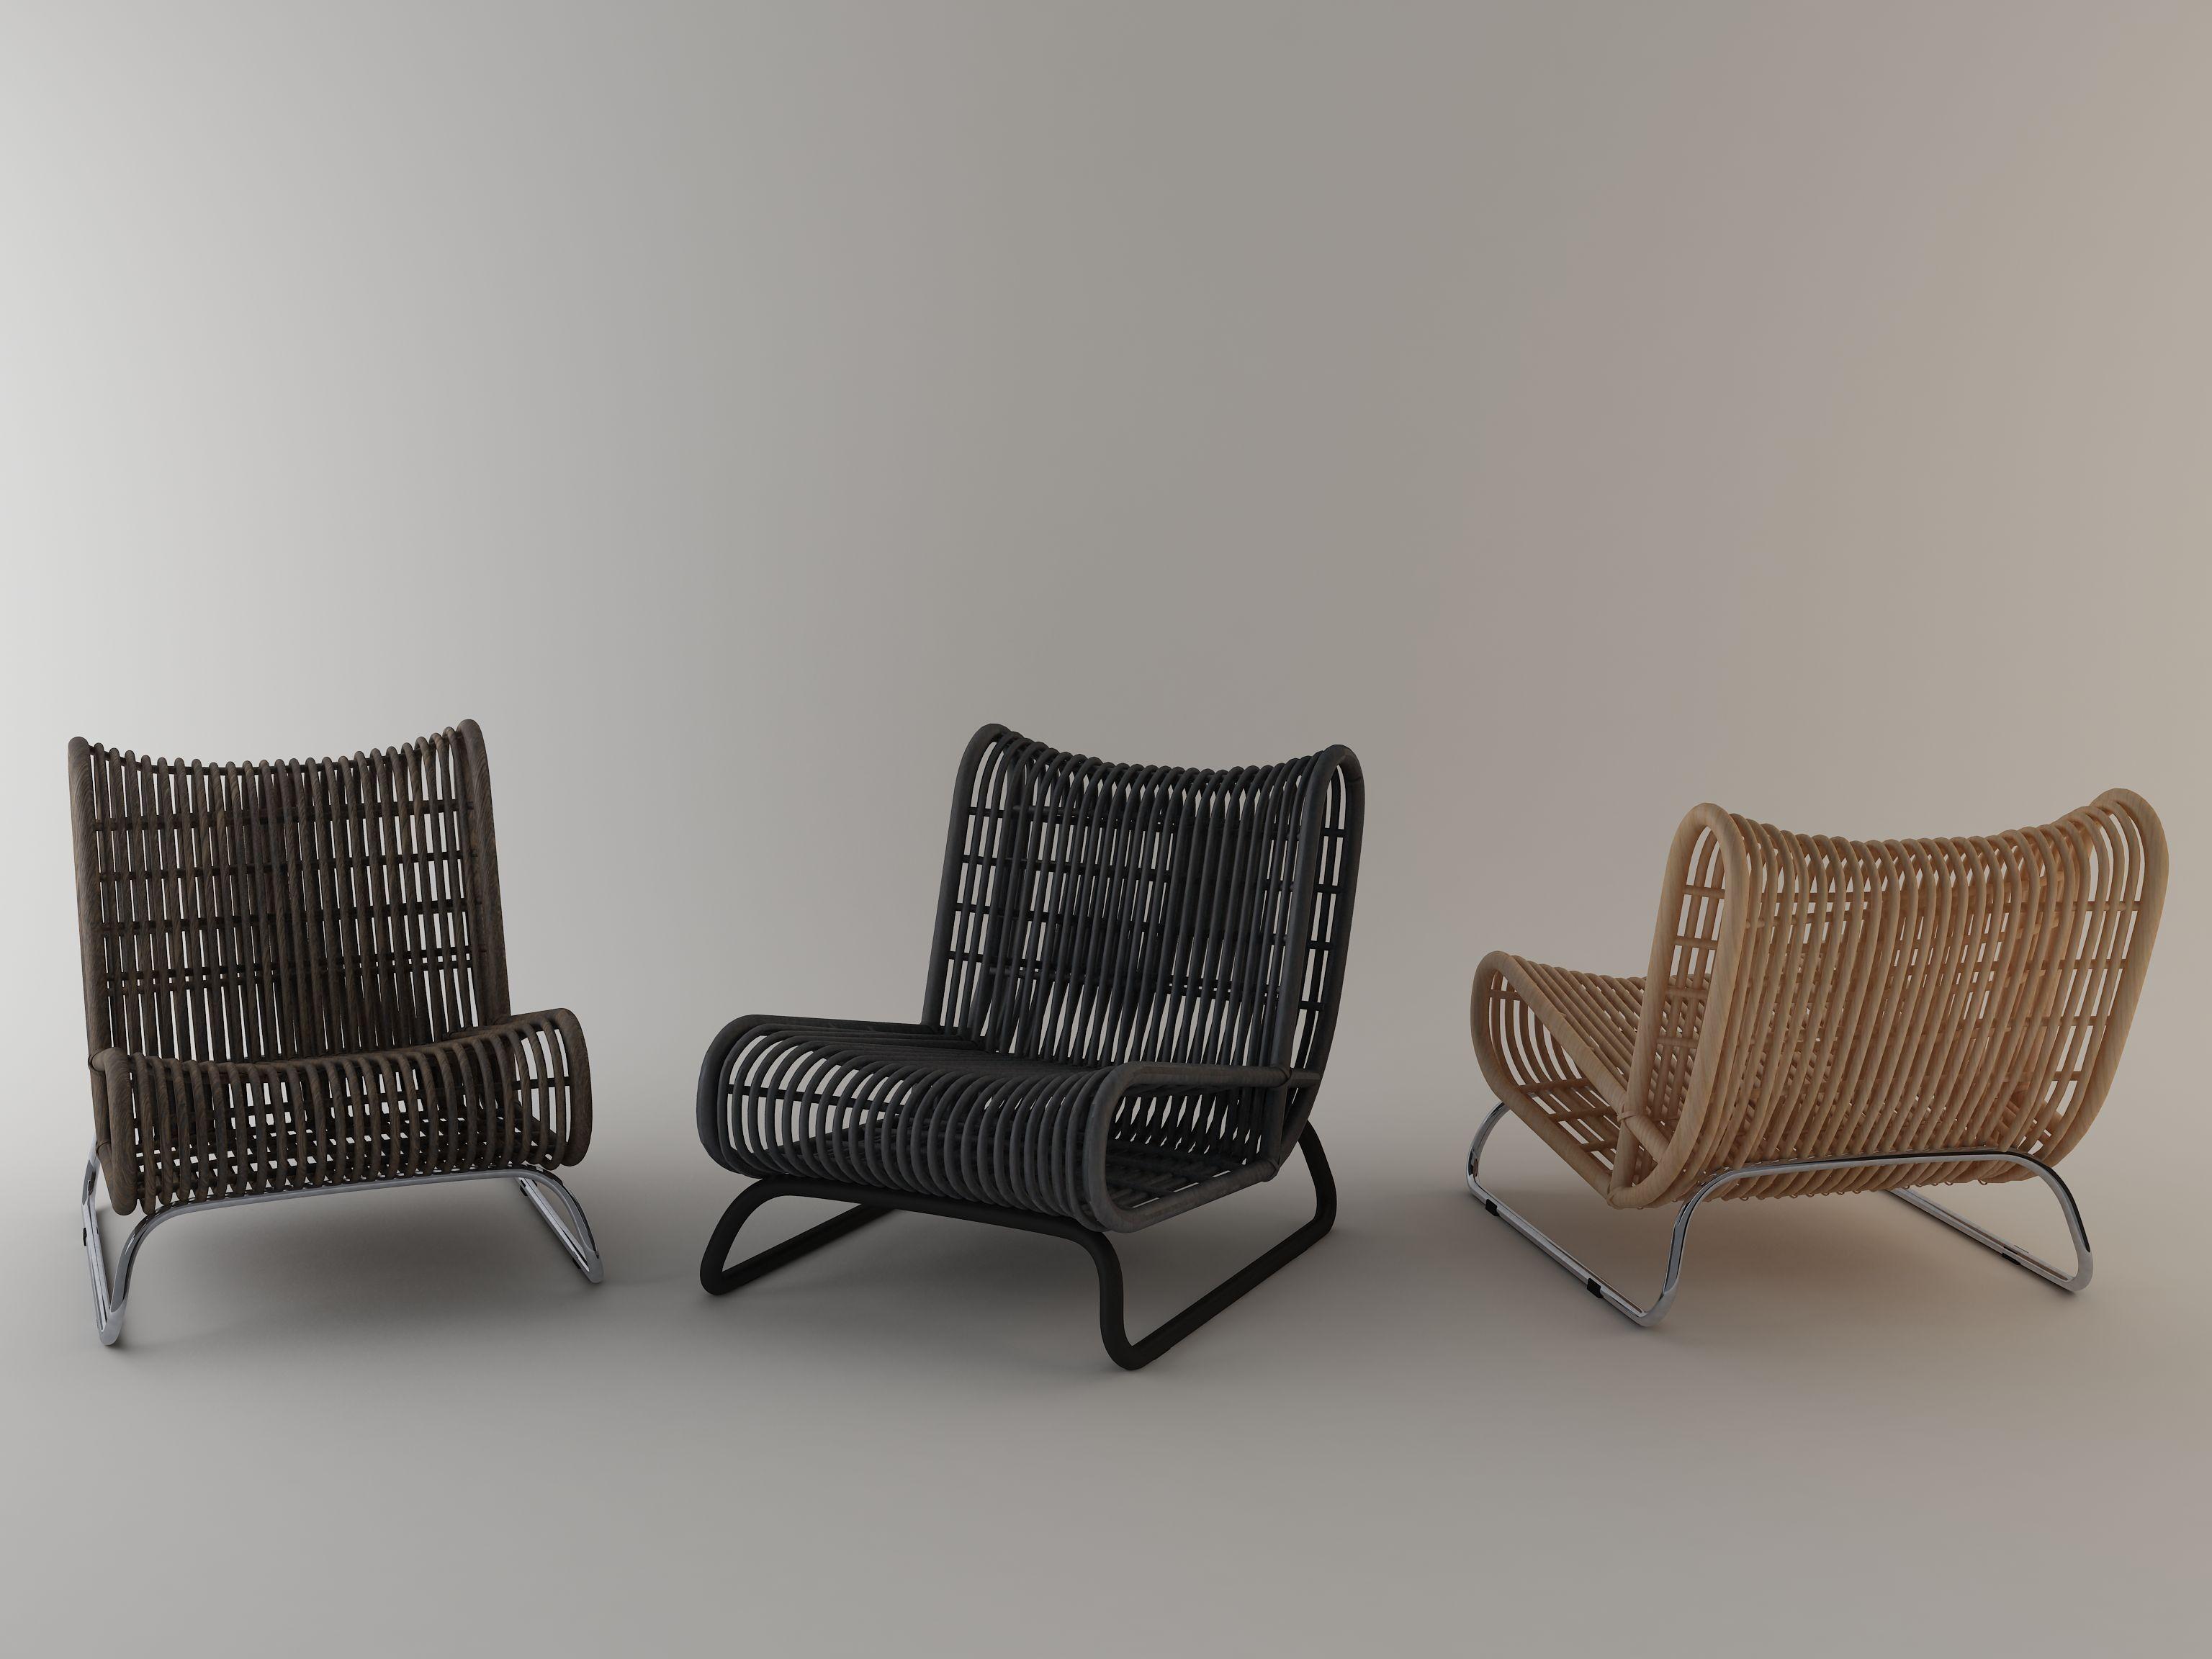 Loop Lounge Chair By Chamdani   Design Abie Abdillah